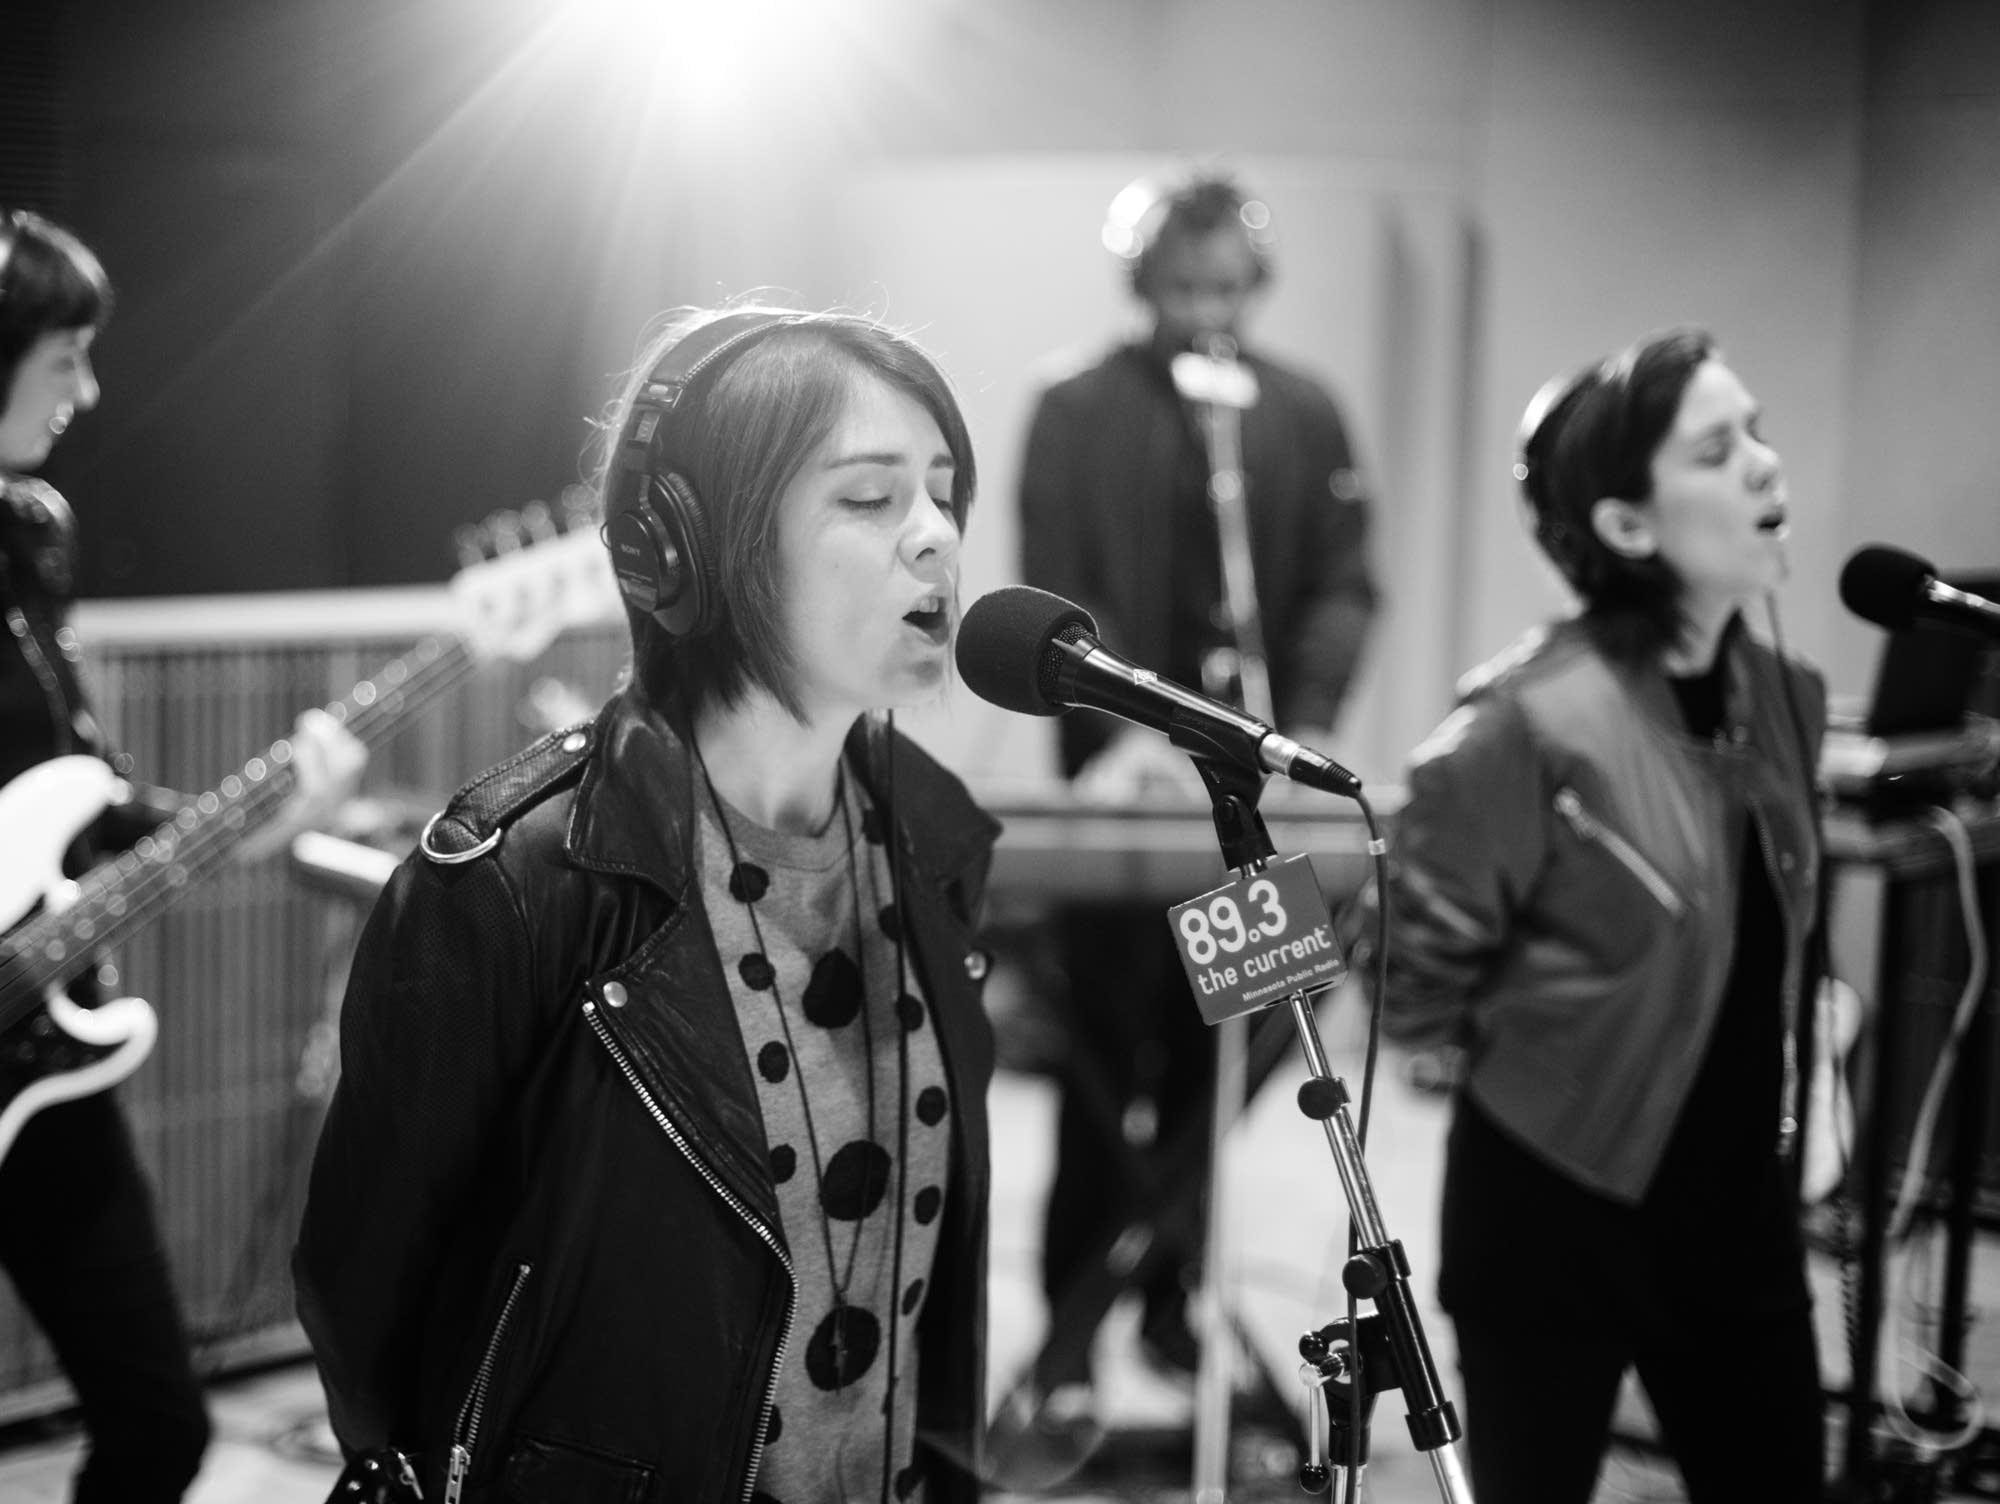 Tegan and Sara perform in The Current studio